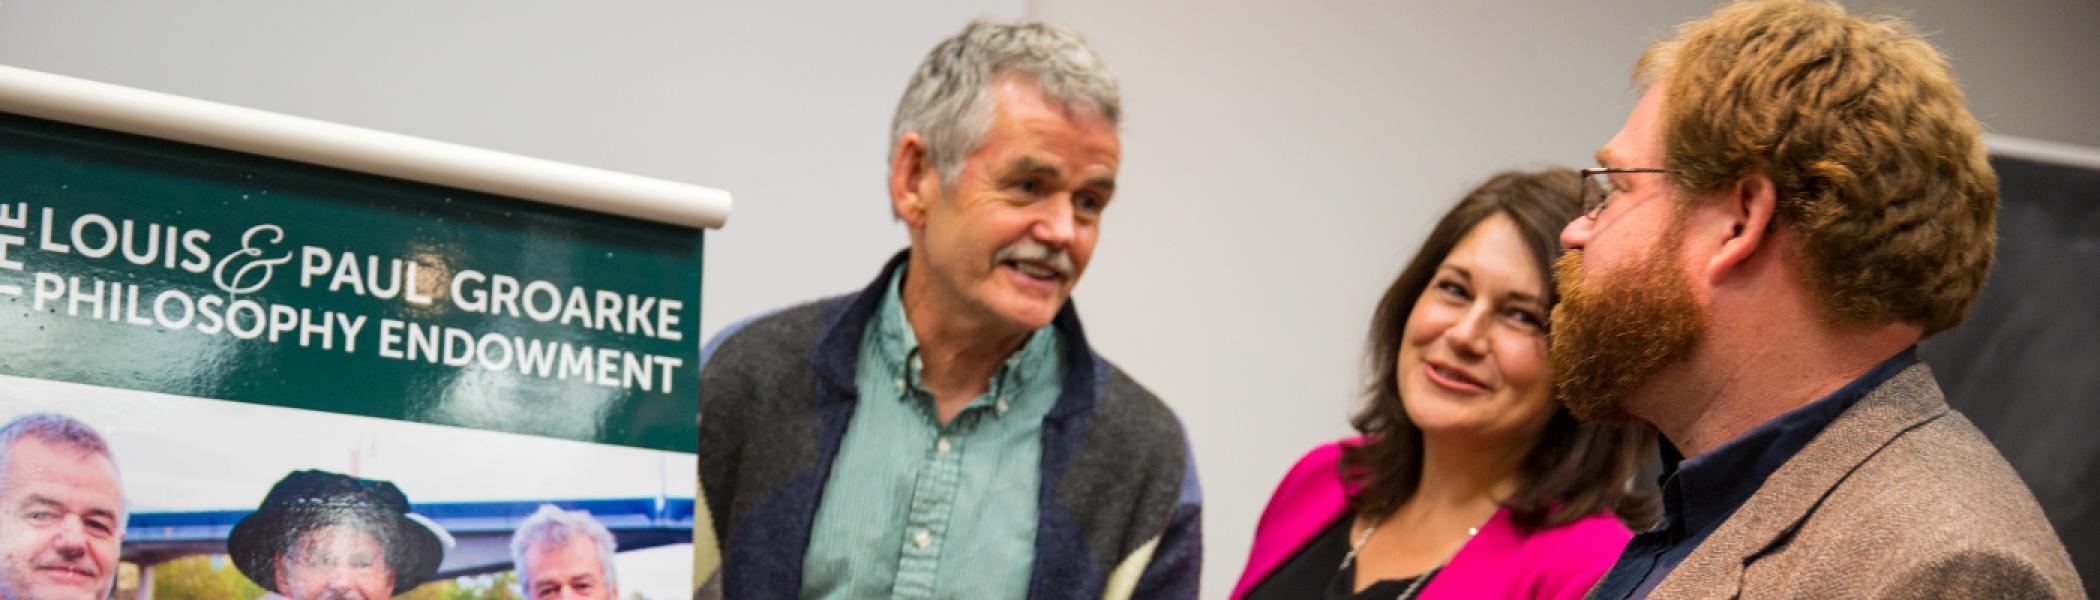 Dr. Leo Groarke with Julie Davis and philosophy professor